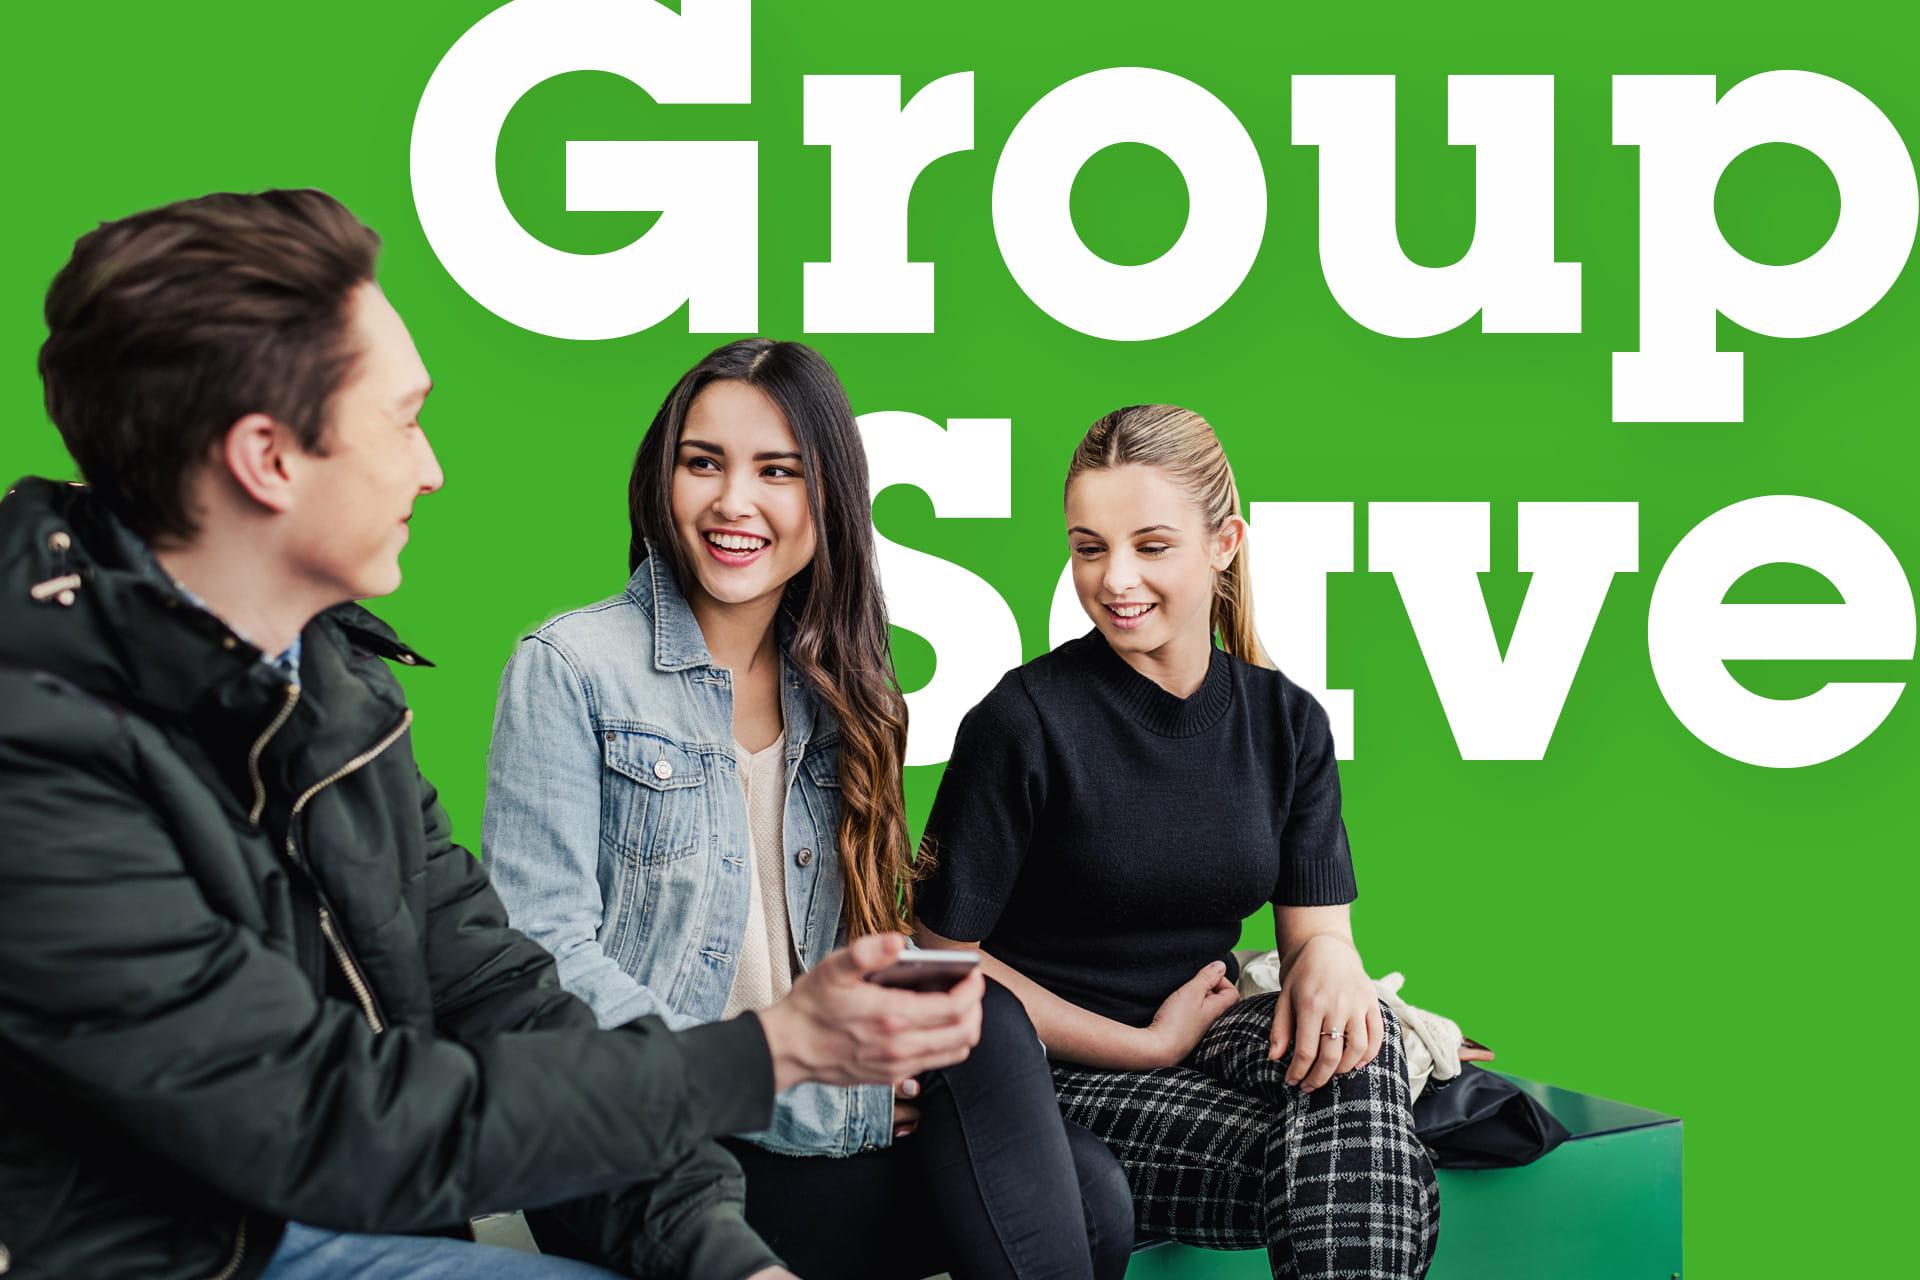 GroupSave